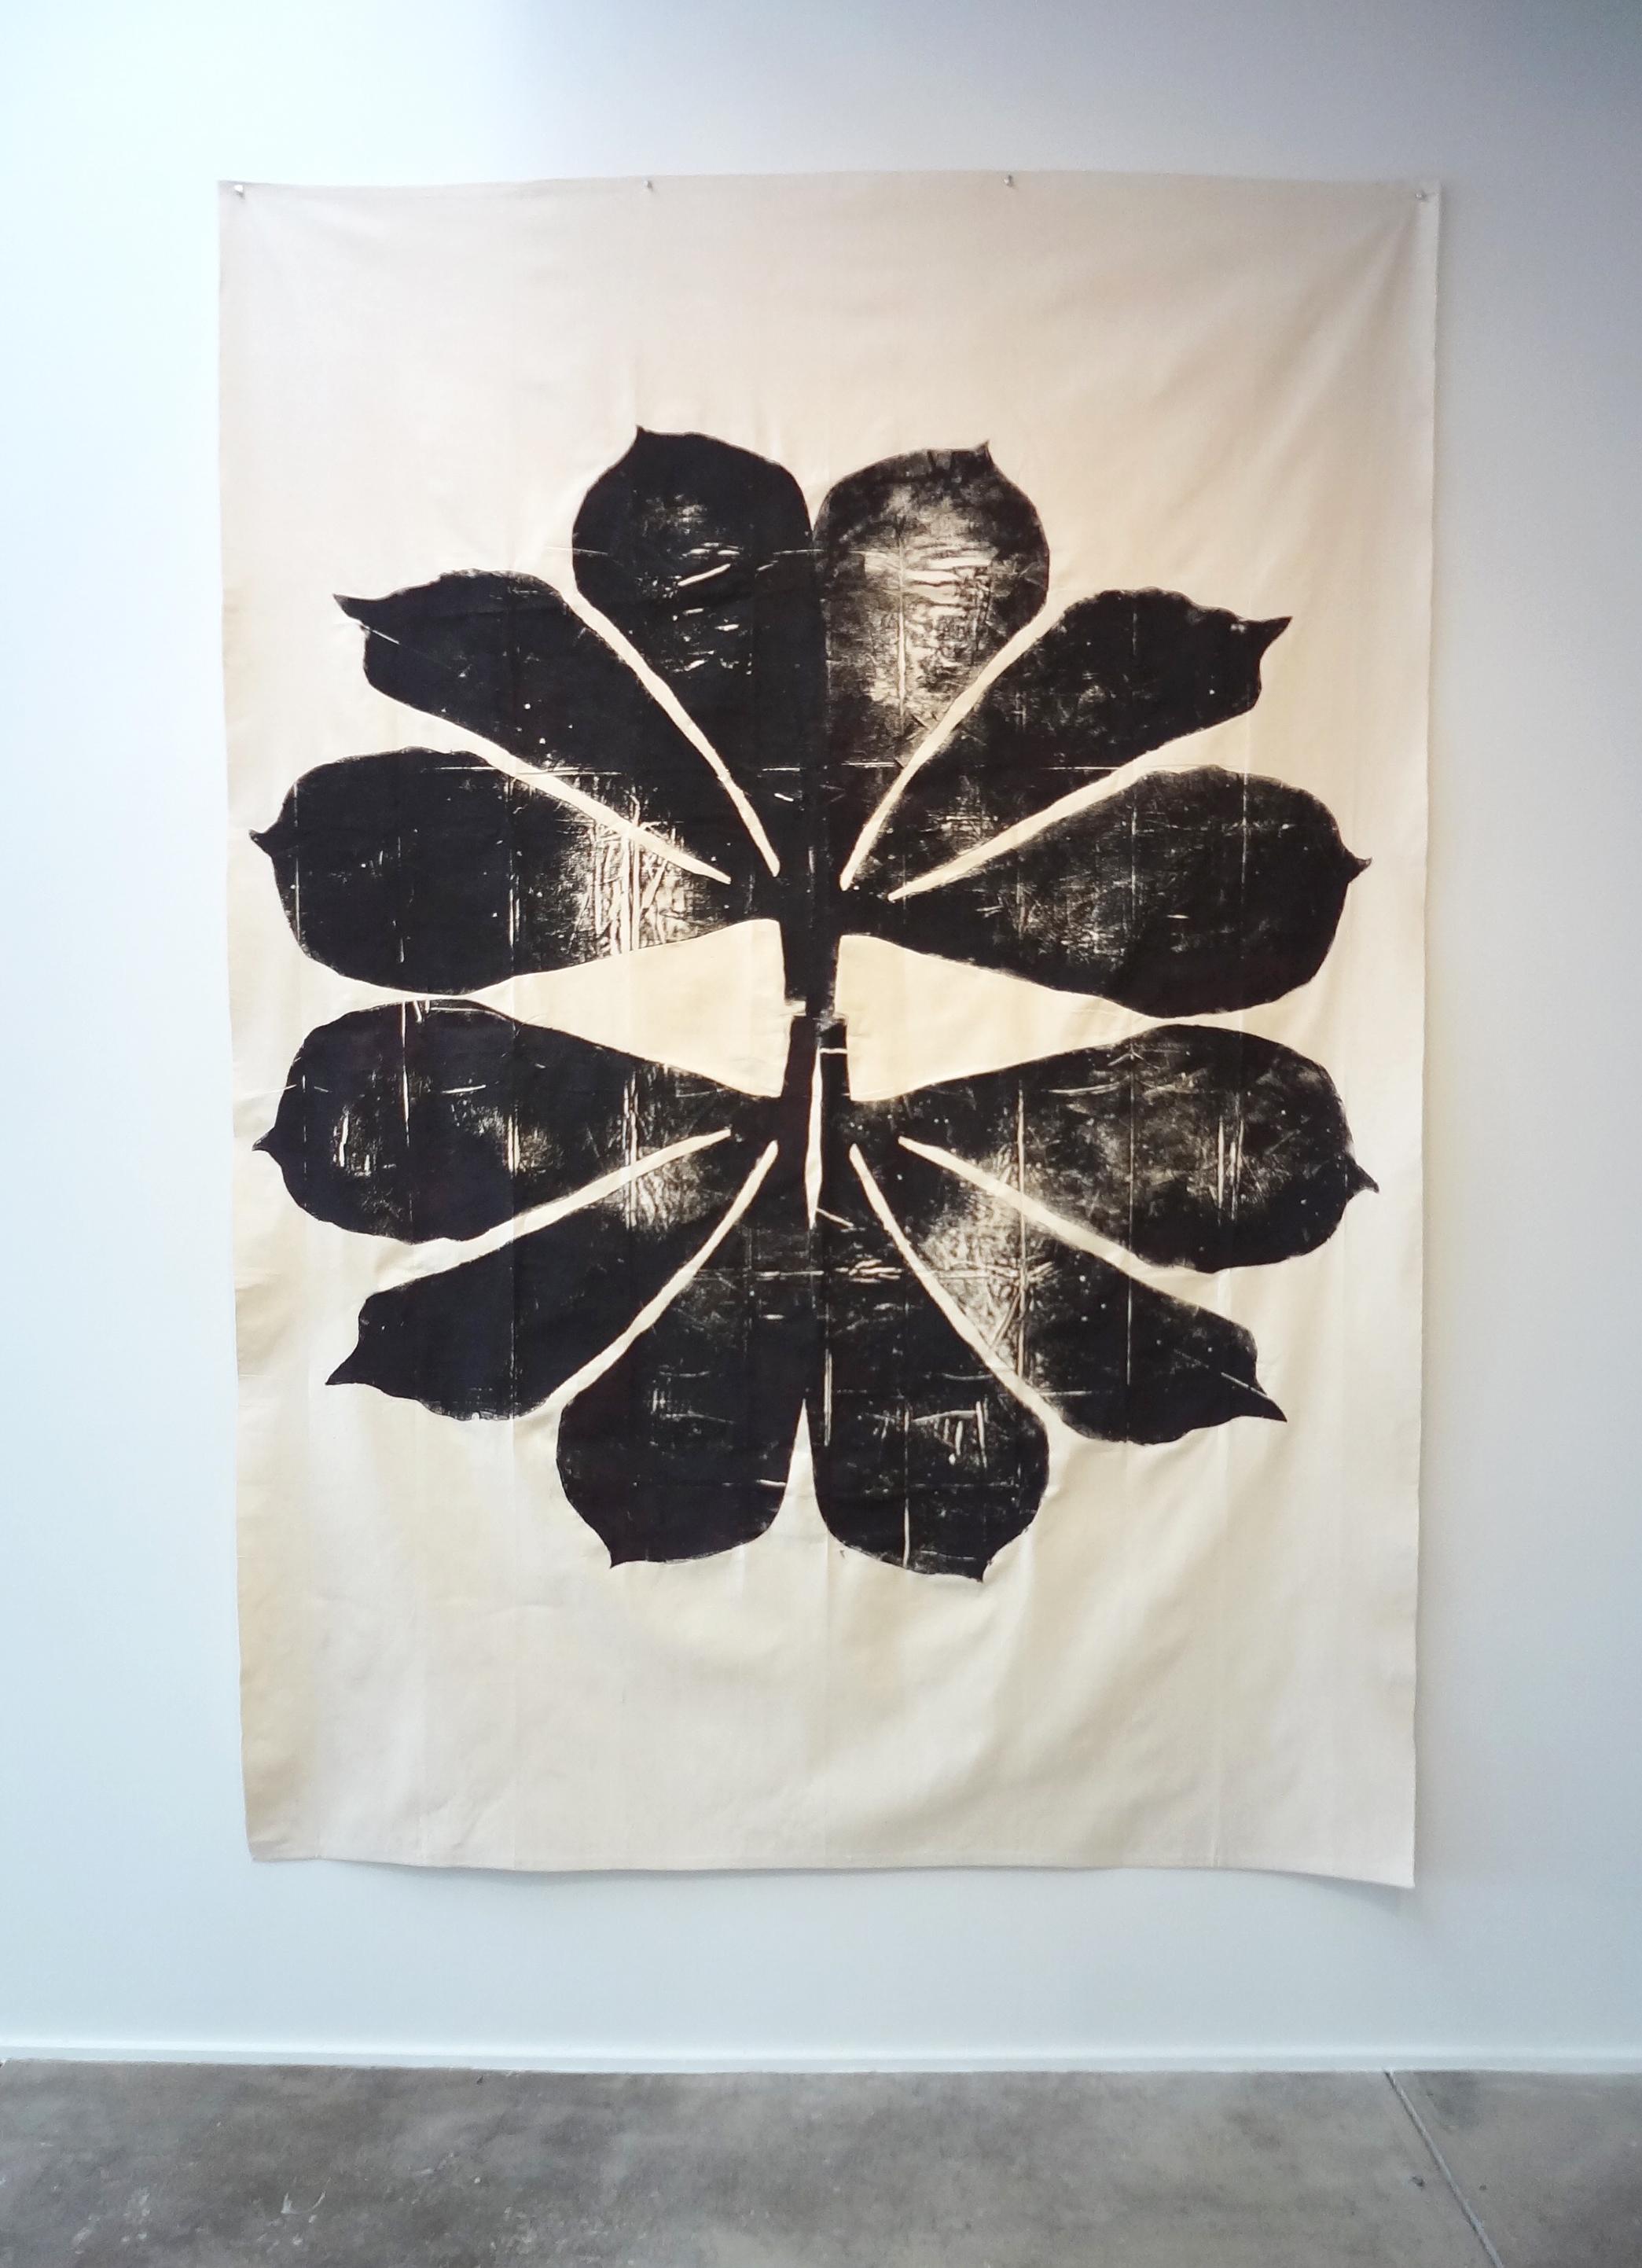 Meghan Gerety  Black Star , 2015 blockprint ink on canvas 108 x 72 in.